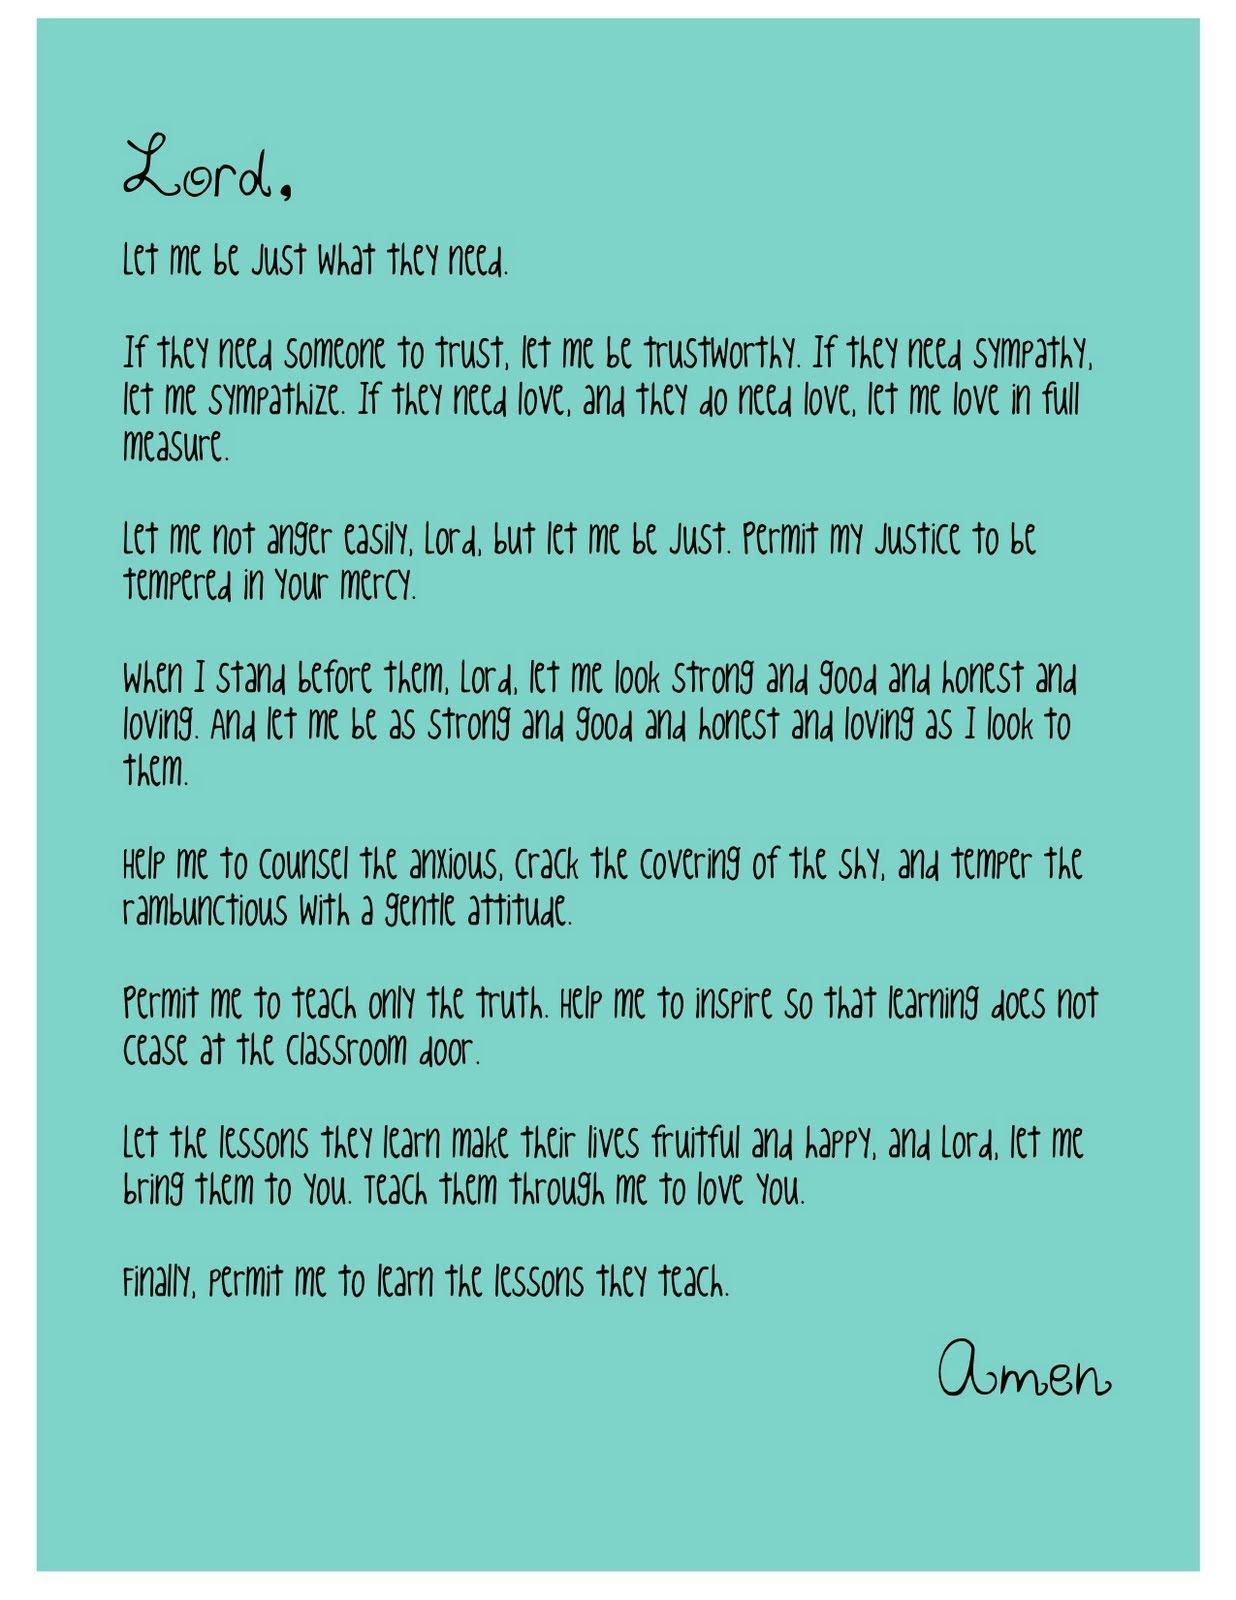 A teacher's prayer - I love this. Amen indeed.